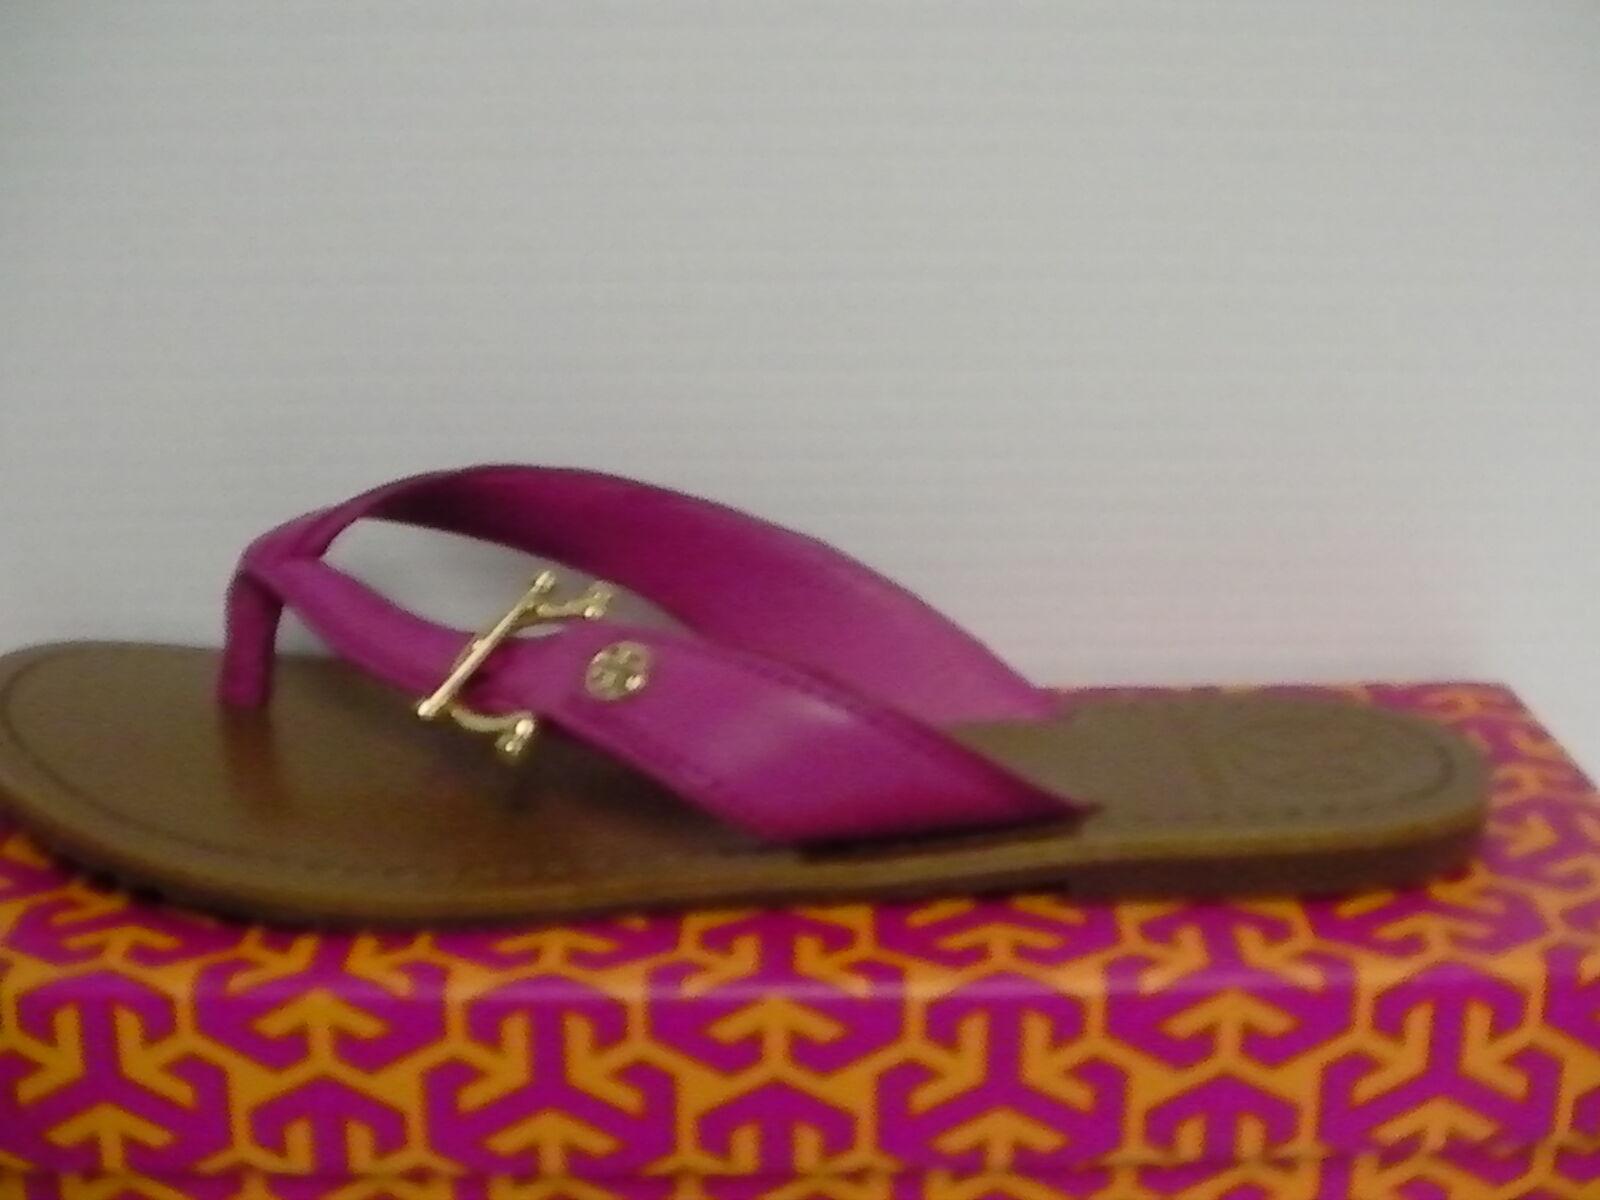 Señora tory burch Nora plana plana plana Thong-mestico fucsia rosadodododo tamaño 7,5 us 1f1ed4